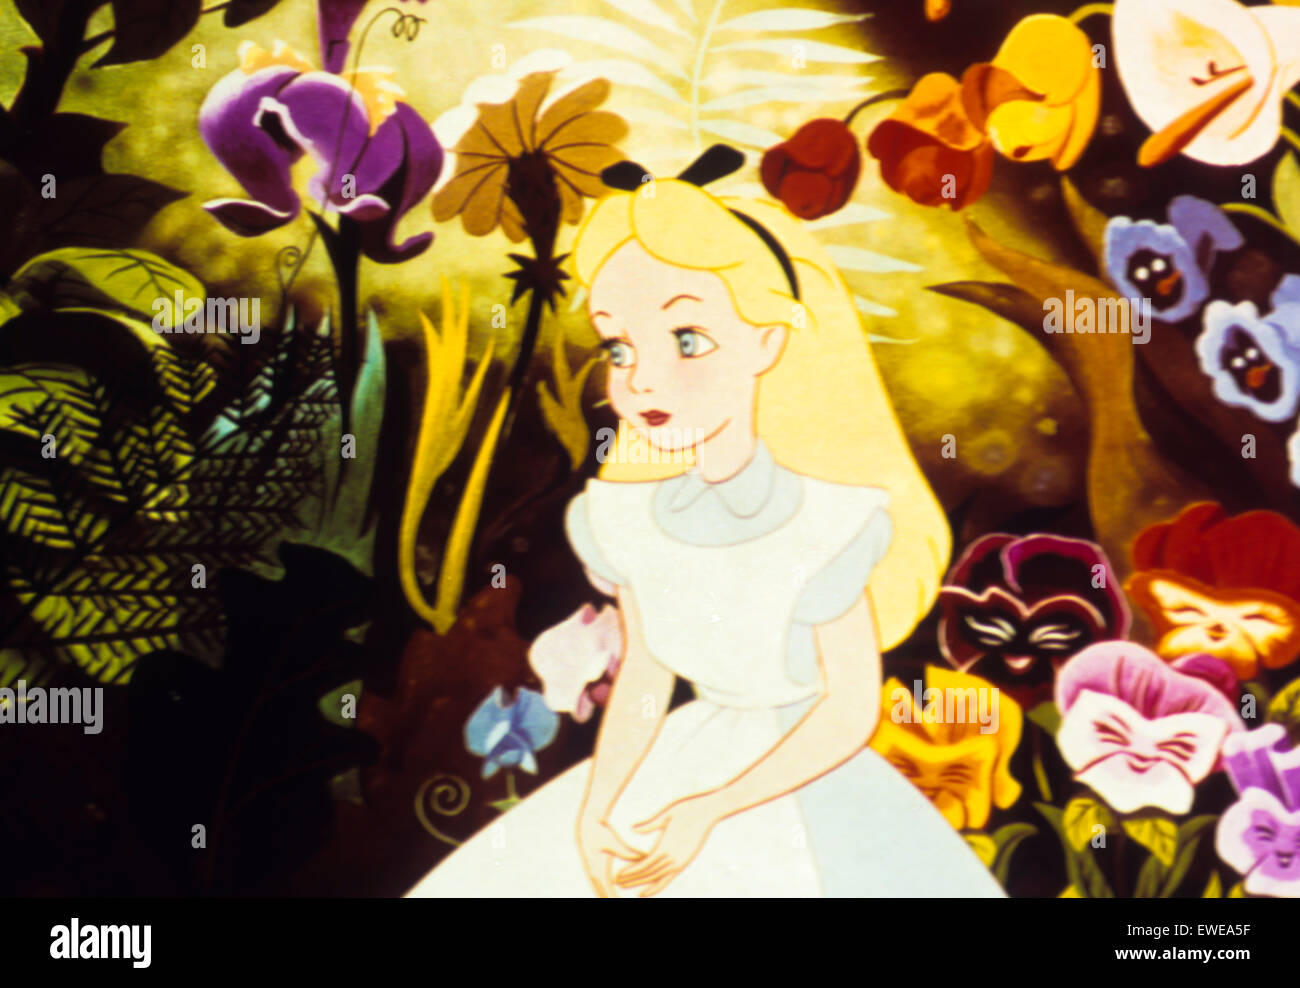 Alice In Wonderland Stock Photos & Alice In Wonderland Stock Images ...